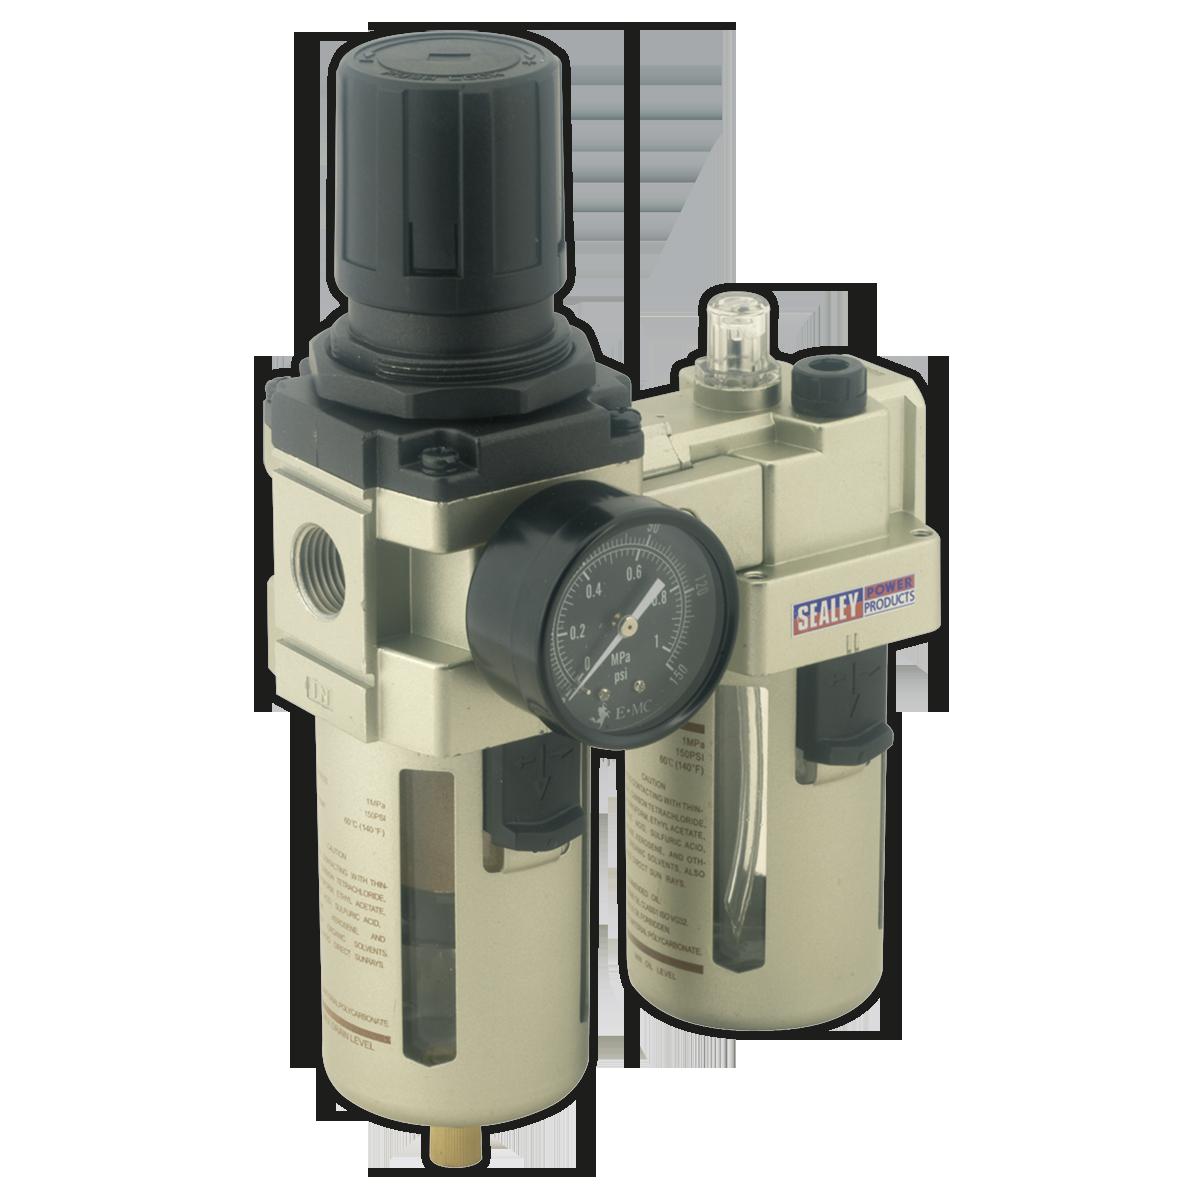 Air Filter/Regulator/Lubricator Max Airflow 105cfm